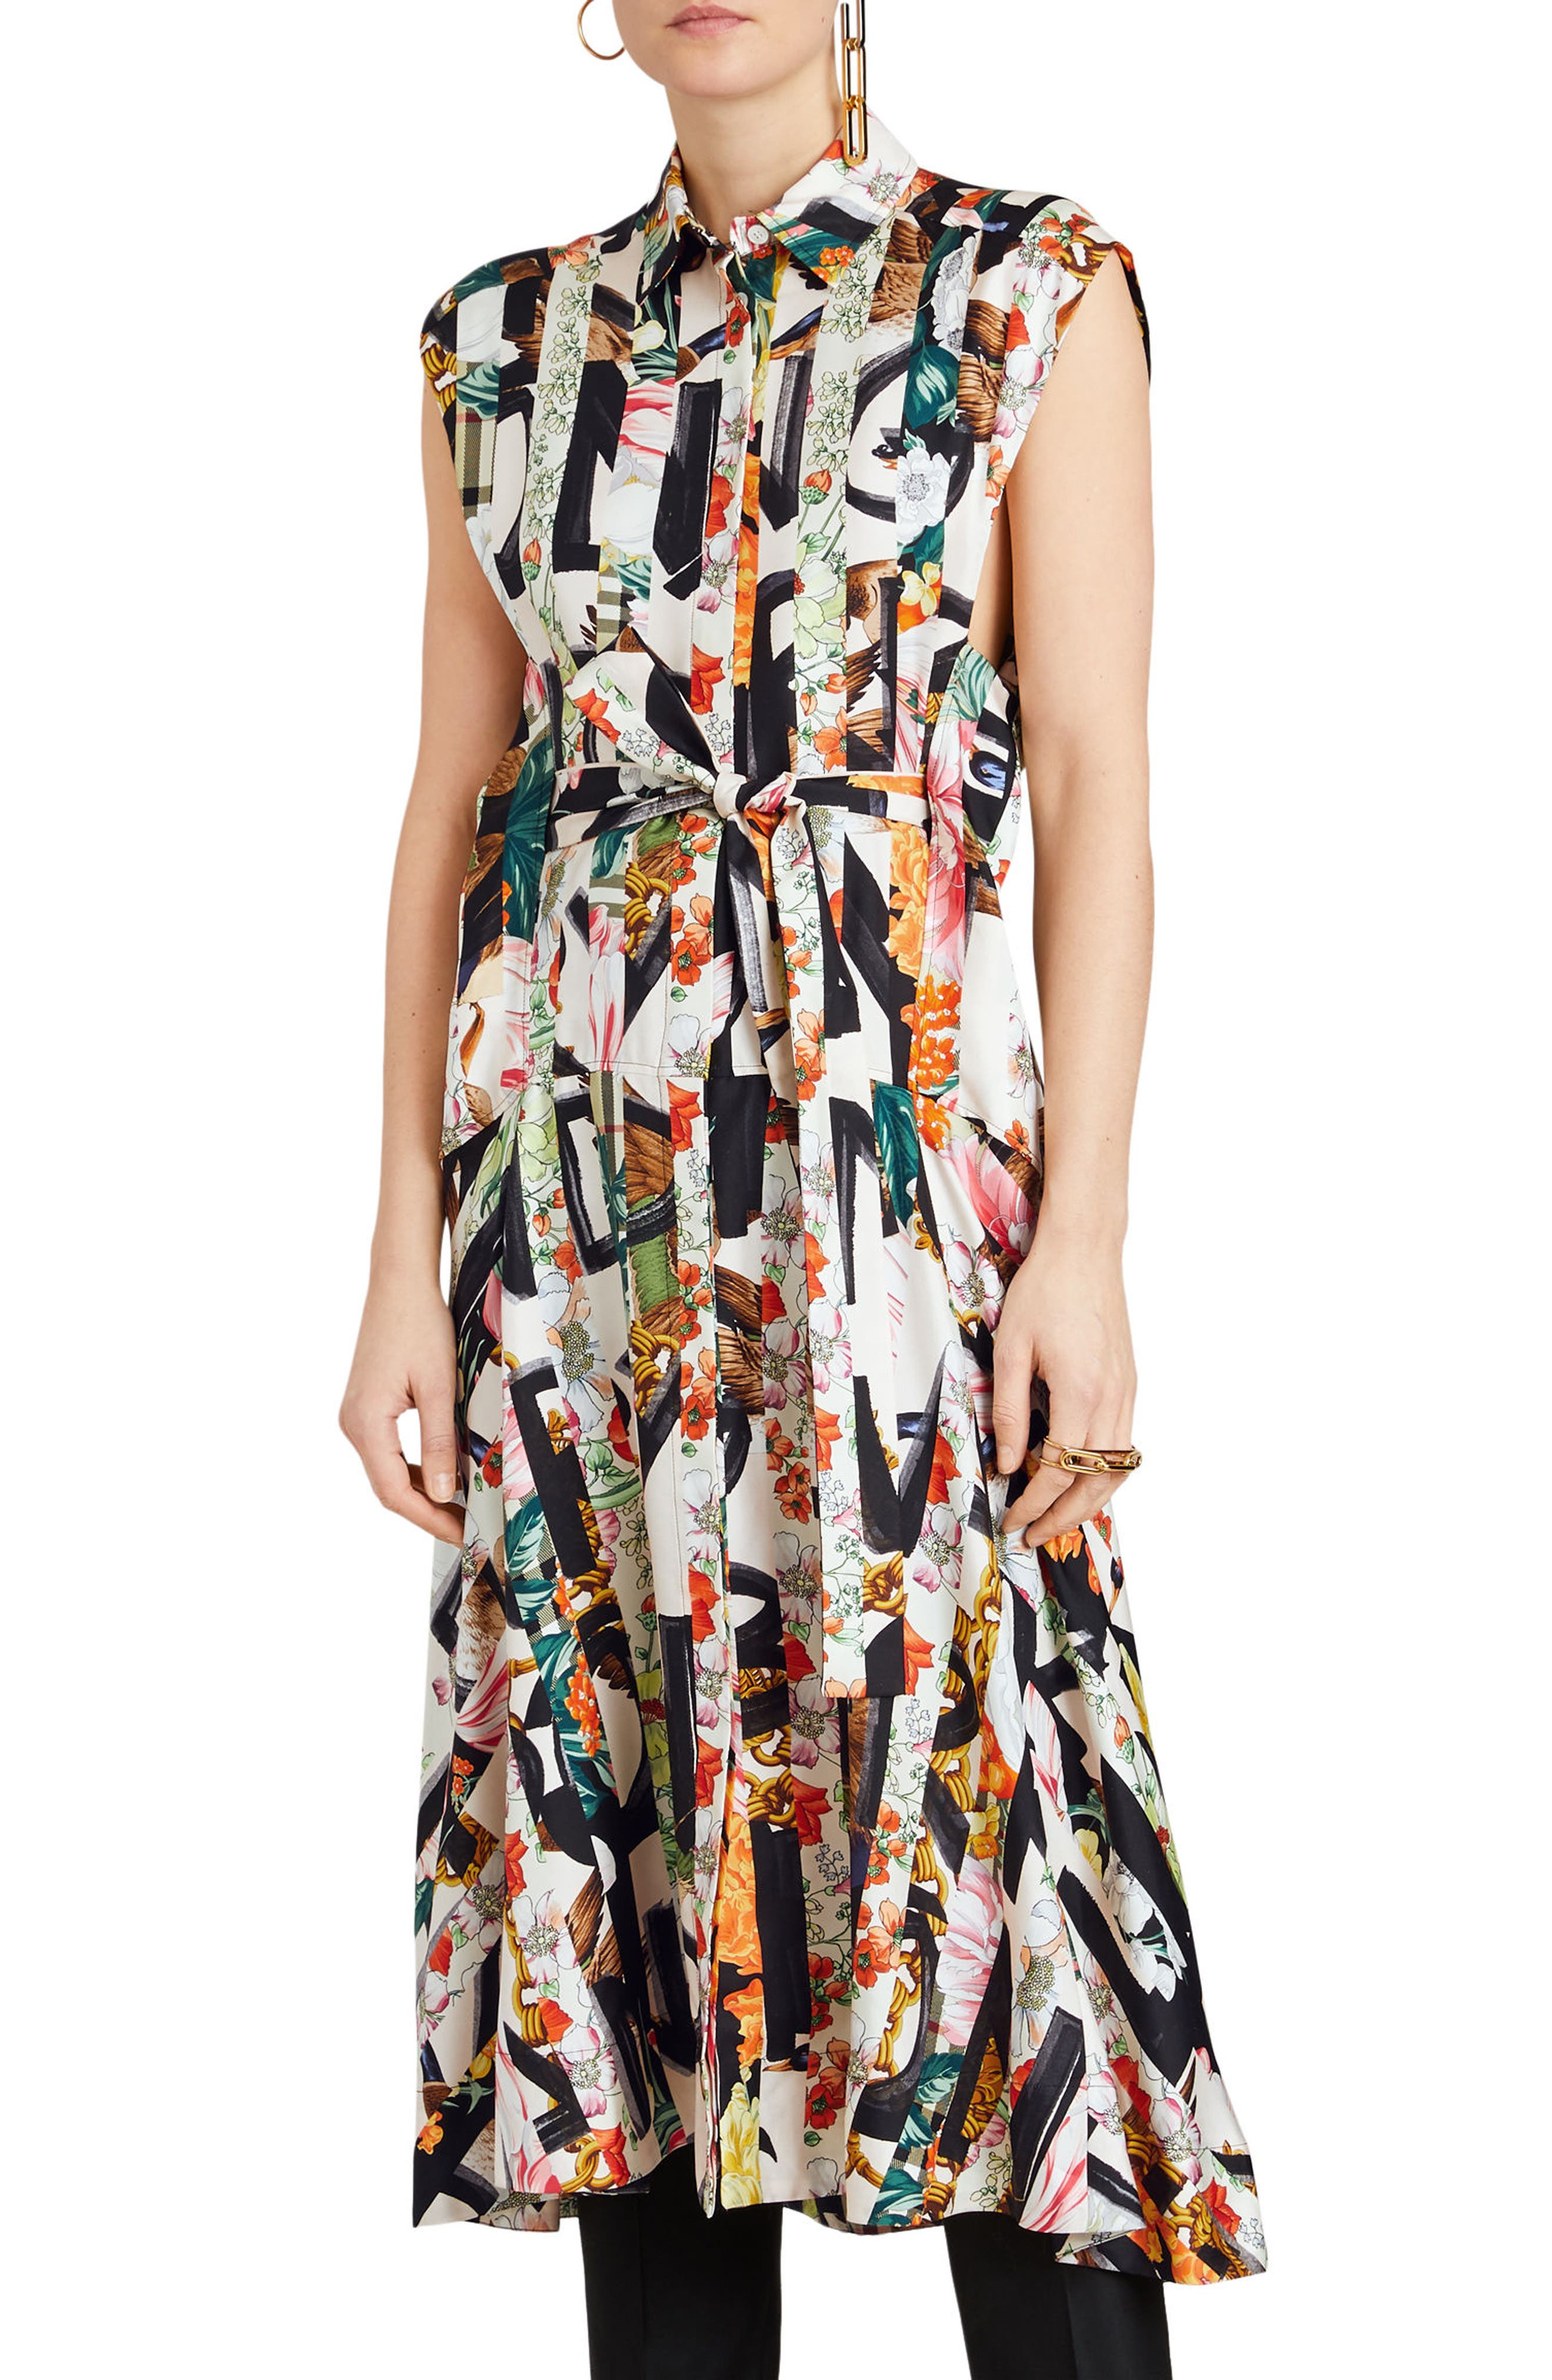 Sacha Silk Dress,                         Main,                         color, MULTICOLOUR IP PTTN